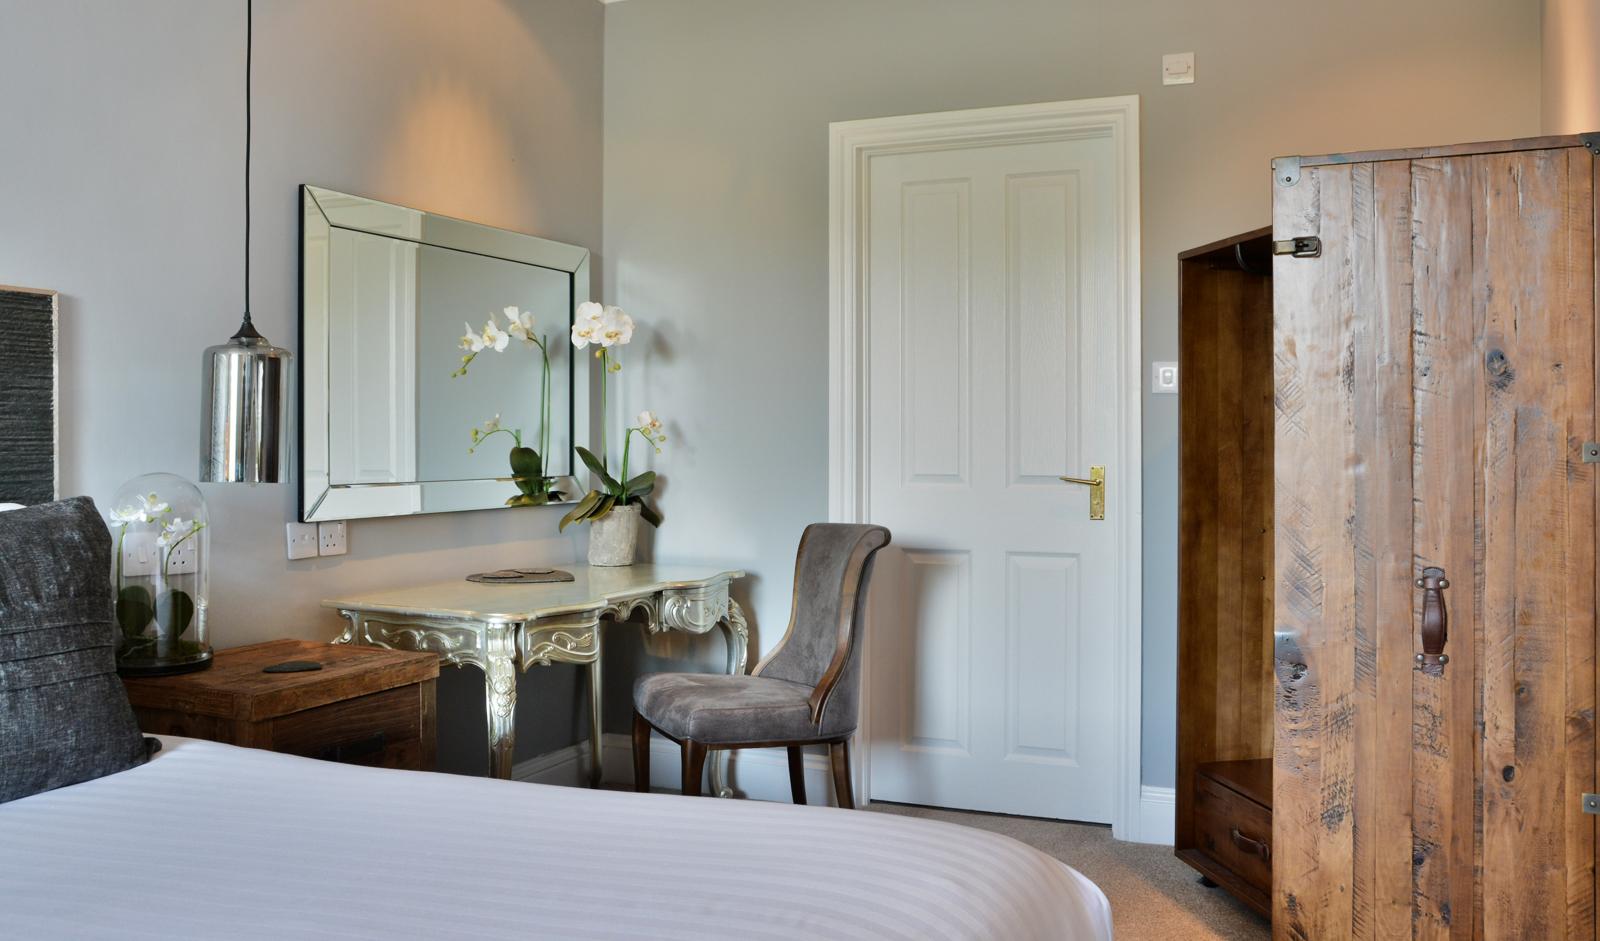 Burnside Hotel & Spa image